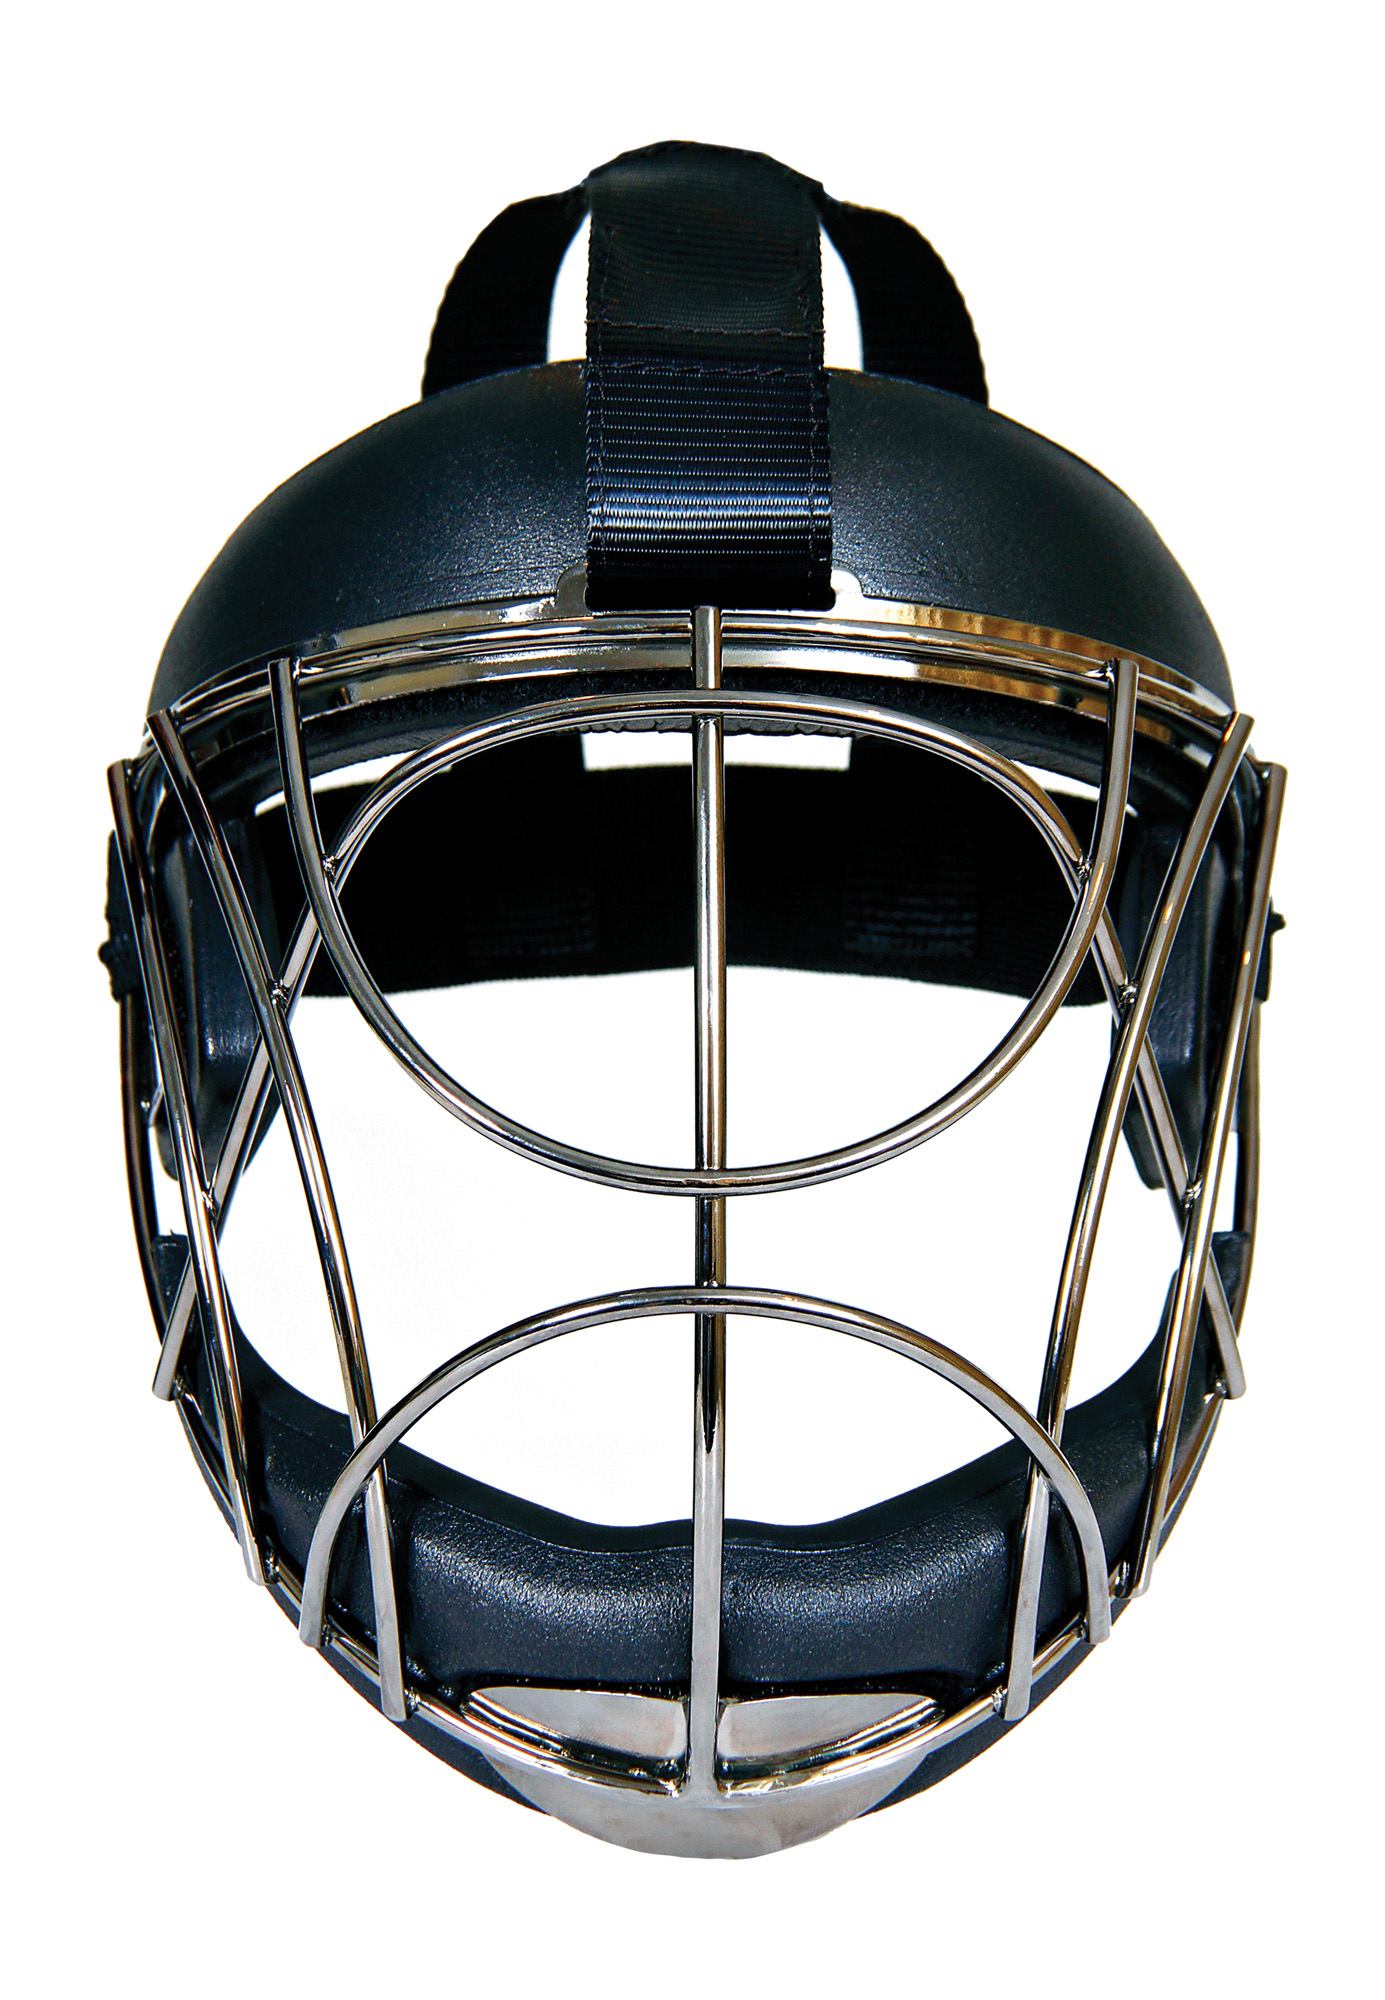 GRAYS 1066286 GR5000 Jumbow Field Hockey Stick